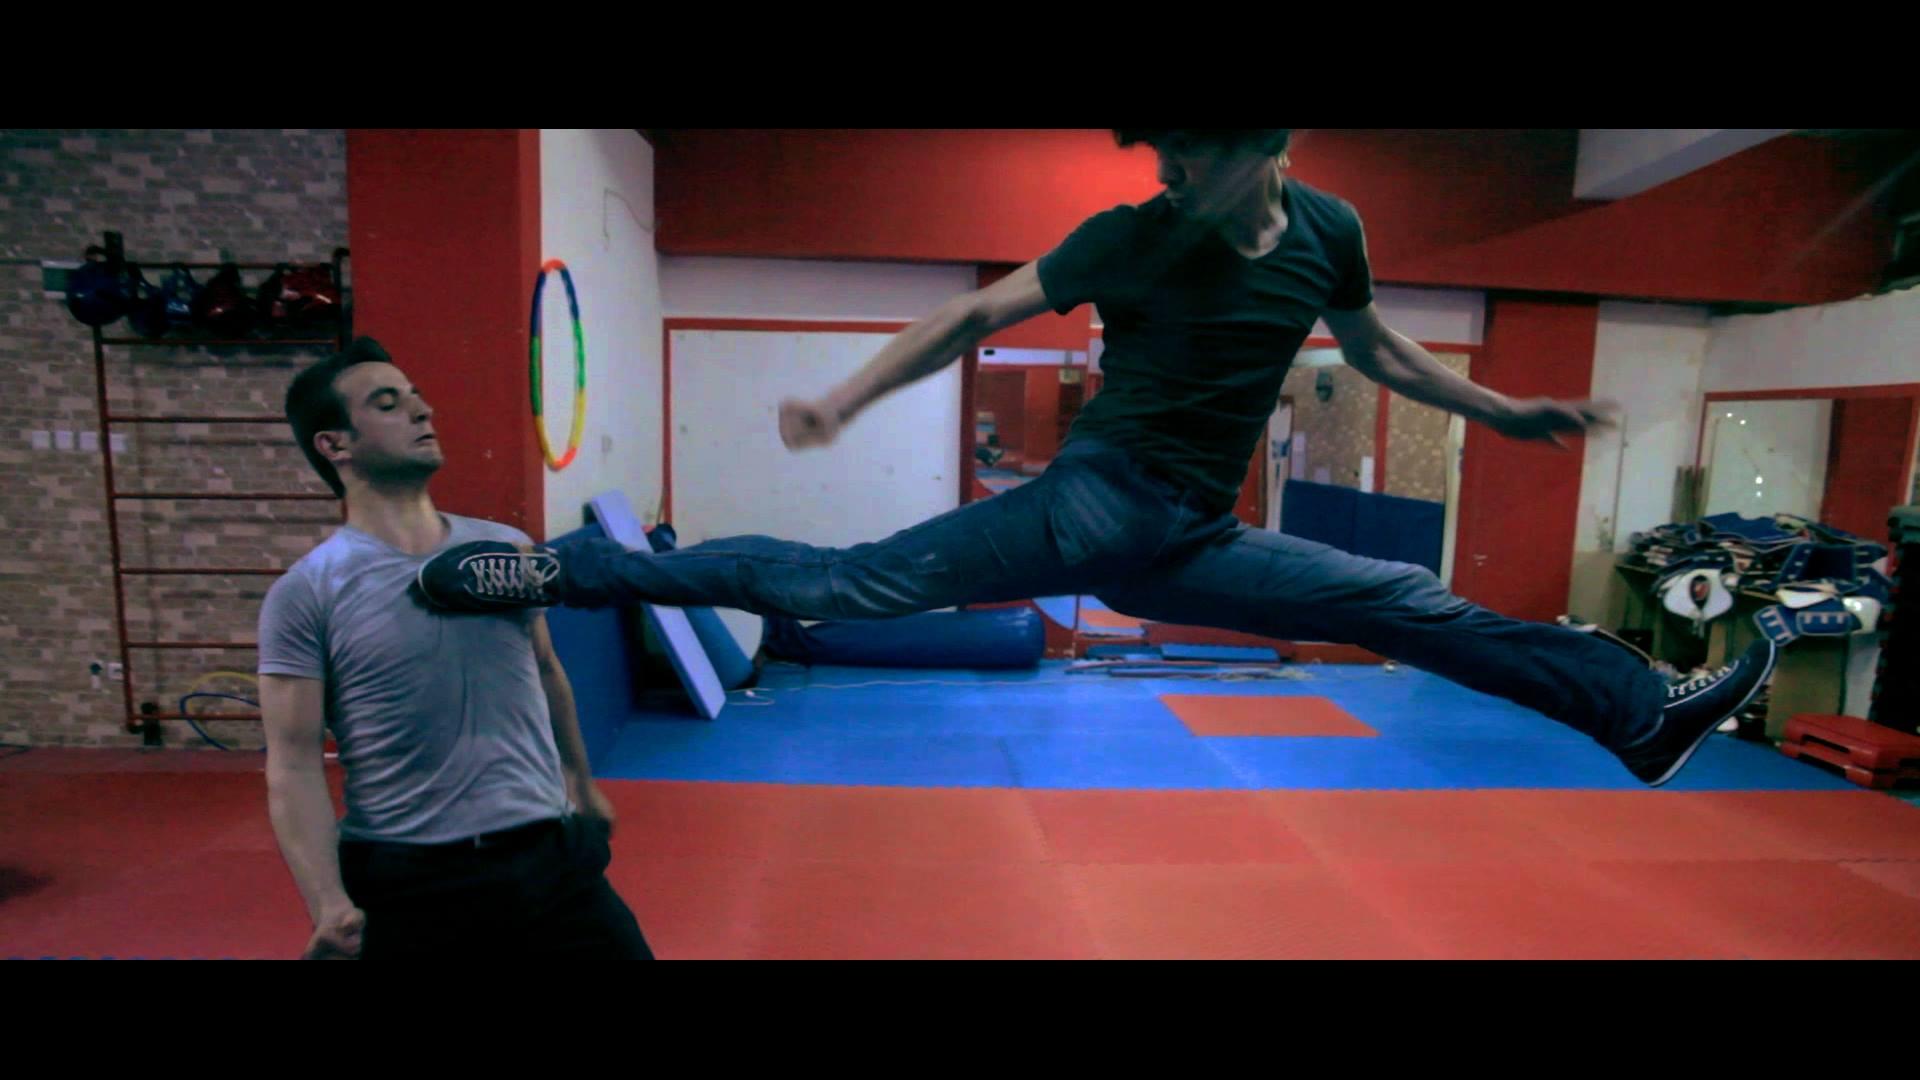 4. Nice back jump spinning kick